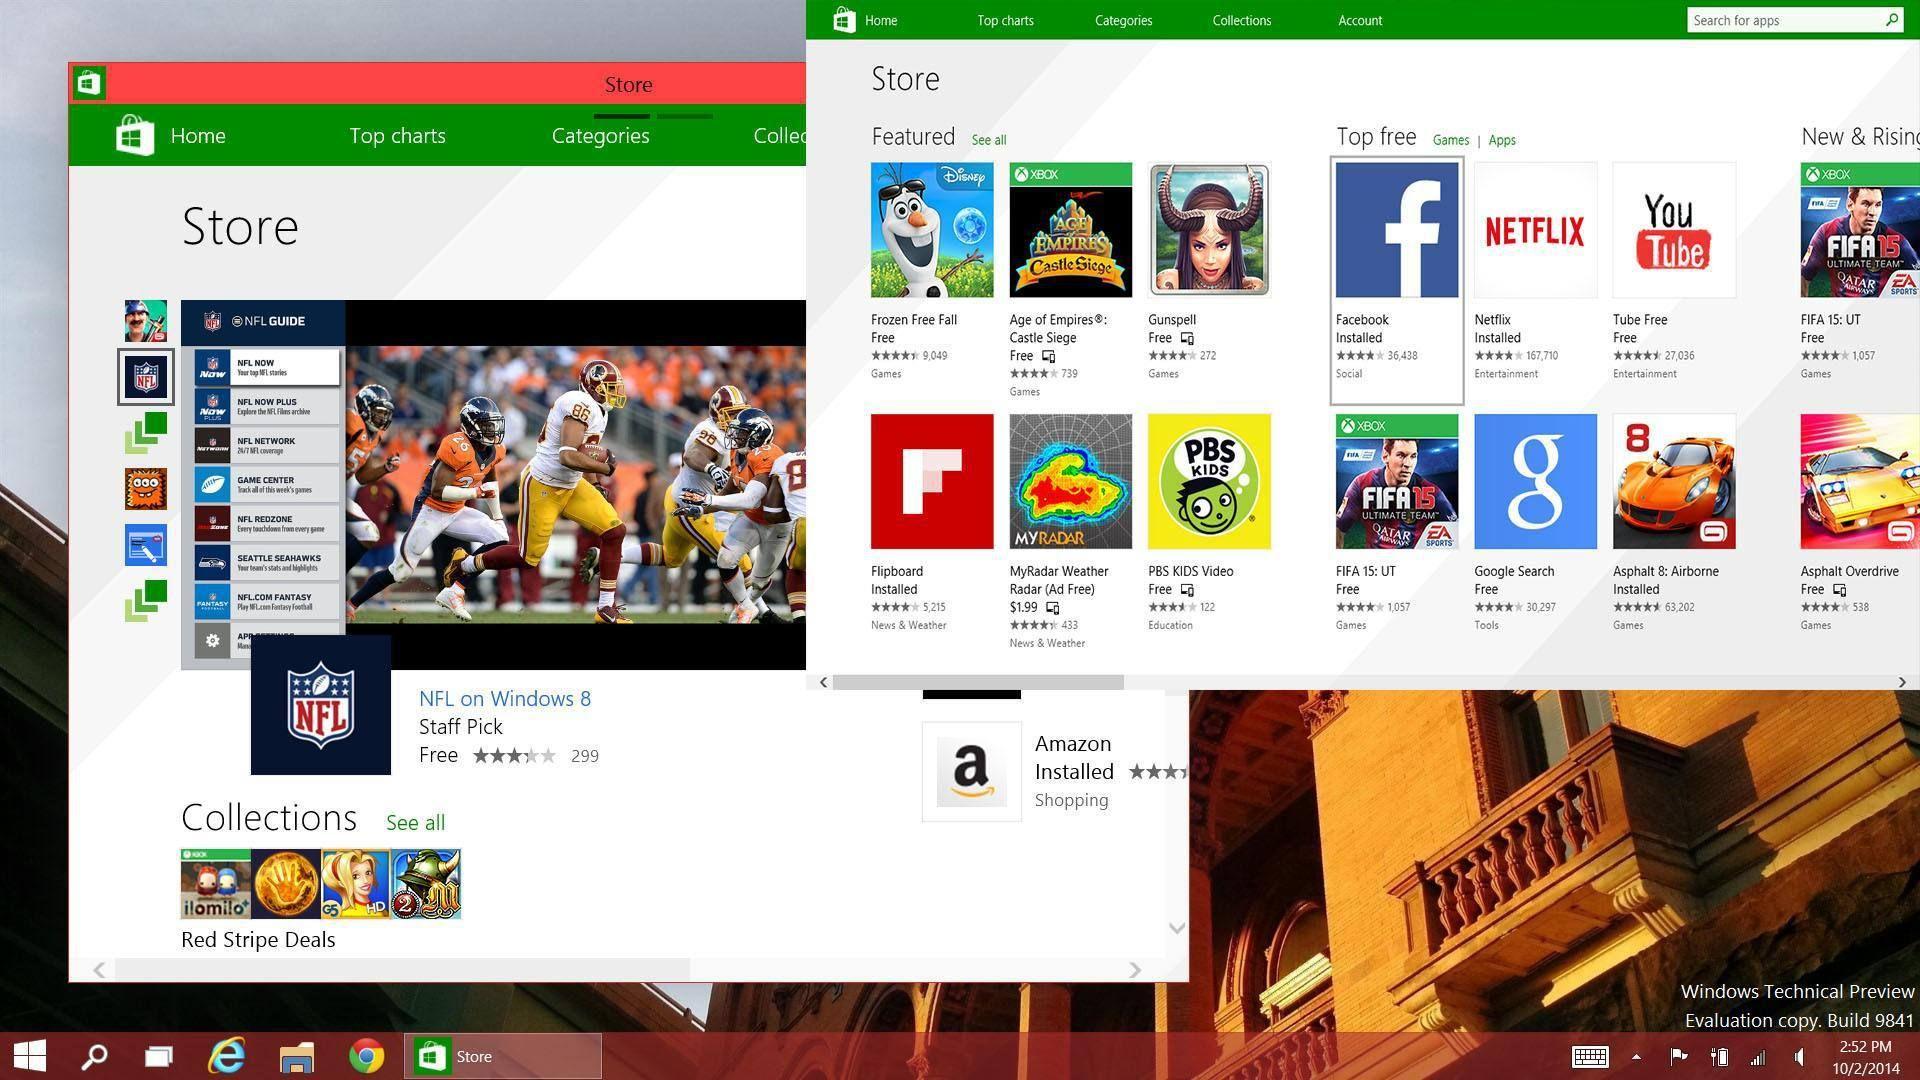 Windows 10 Screenshot 4   Software   Windows 10, Windows 10